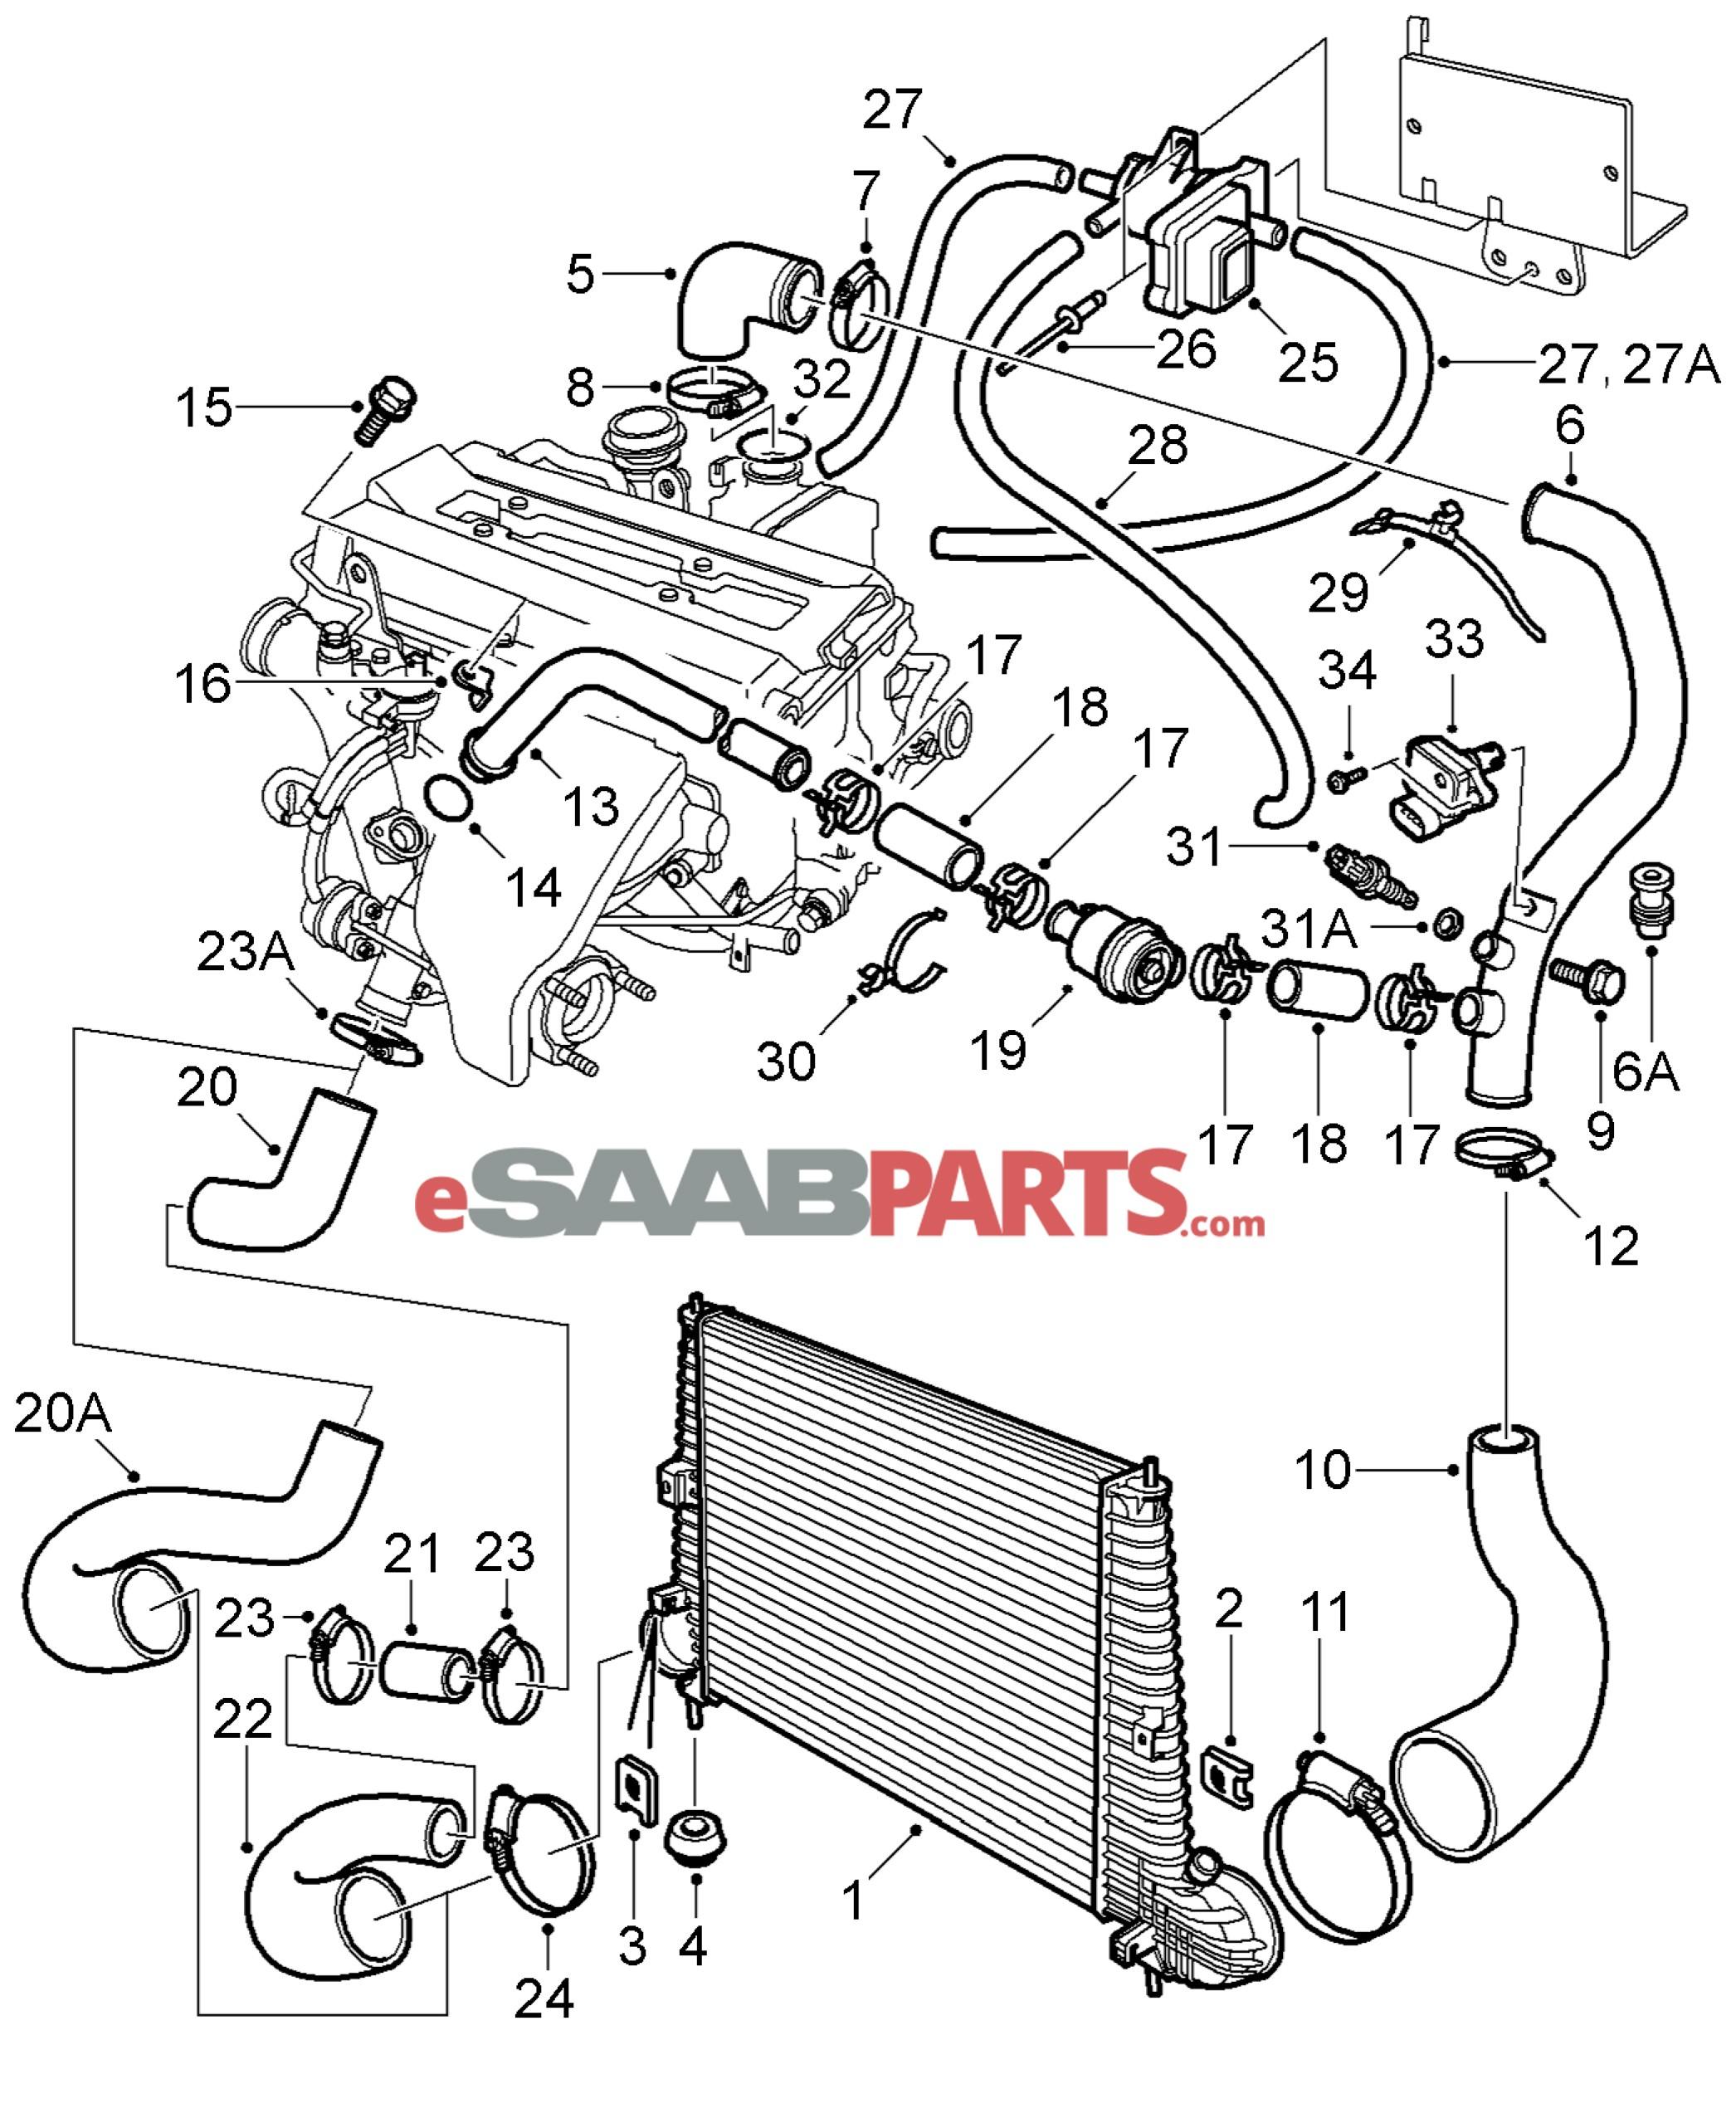 2004 mazda tribute engine diagram my wiring diagram rh detoxicrecenze motor diagram 2003 saab 9